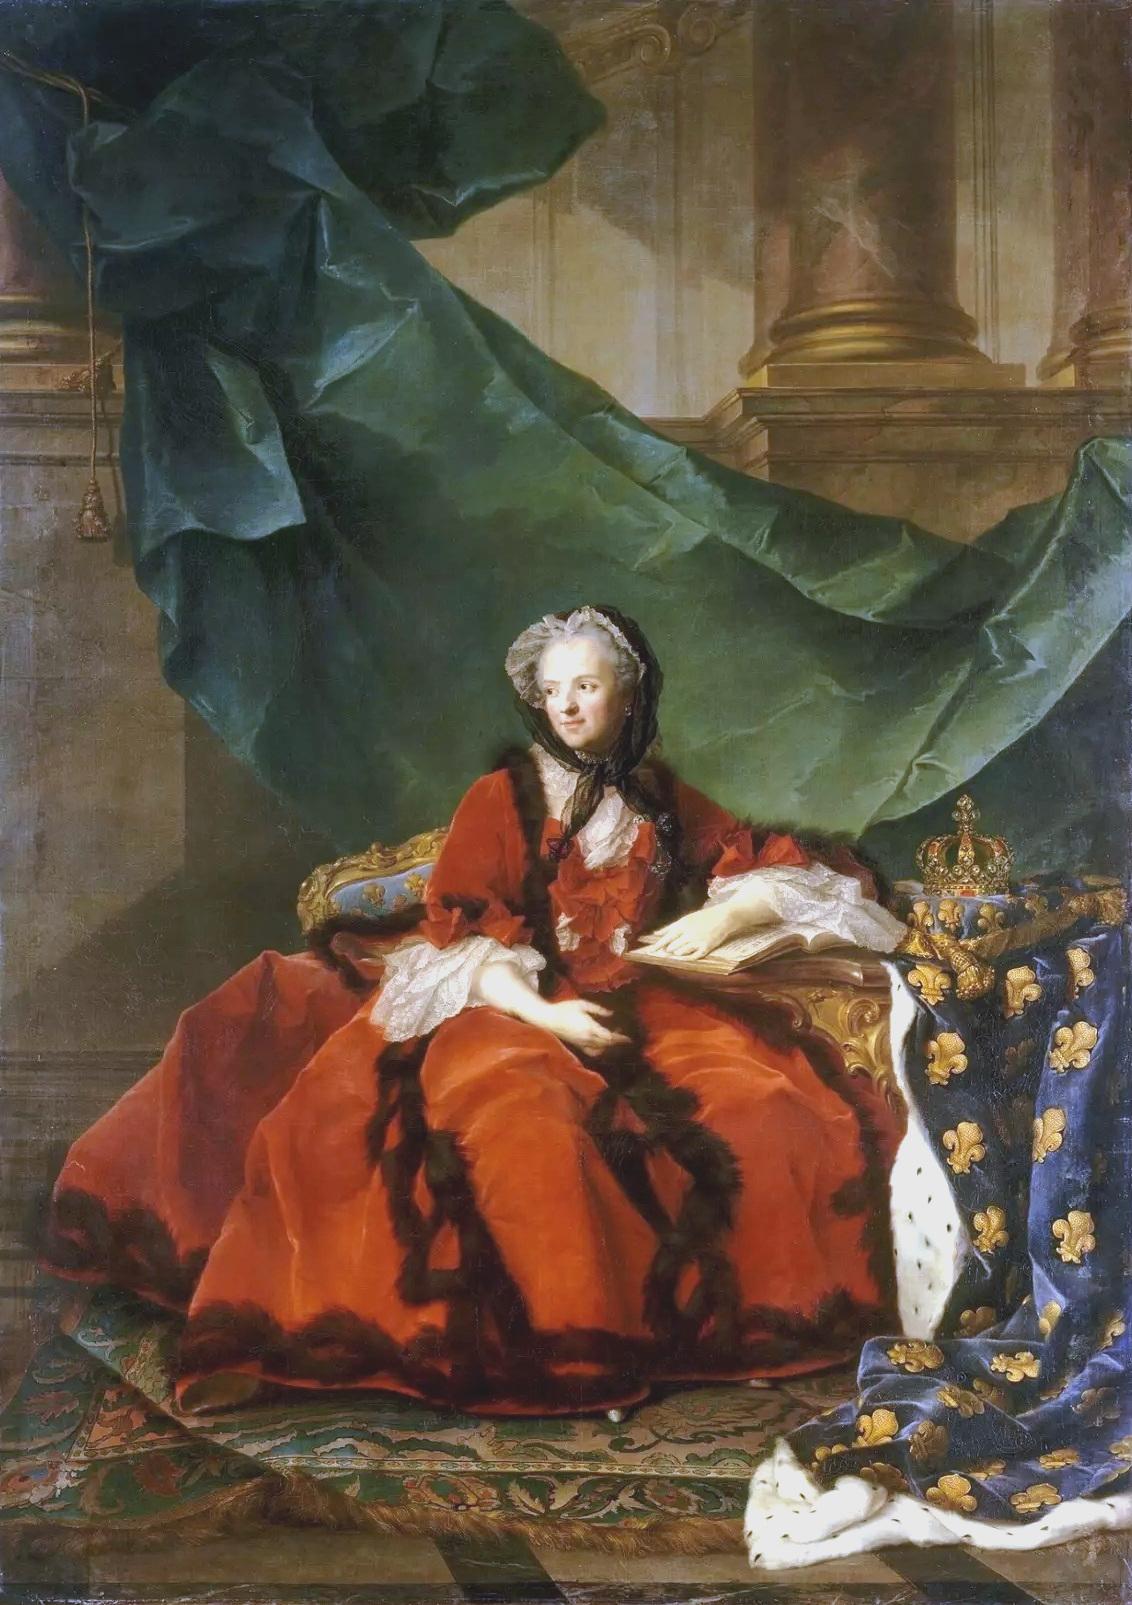 Fichier:Jean-marc-nattier-portrait-of-maria-leszczynska-148451.jpg ...